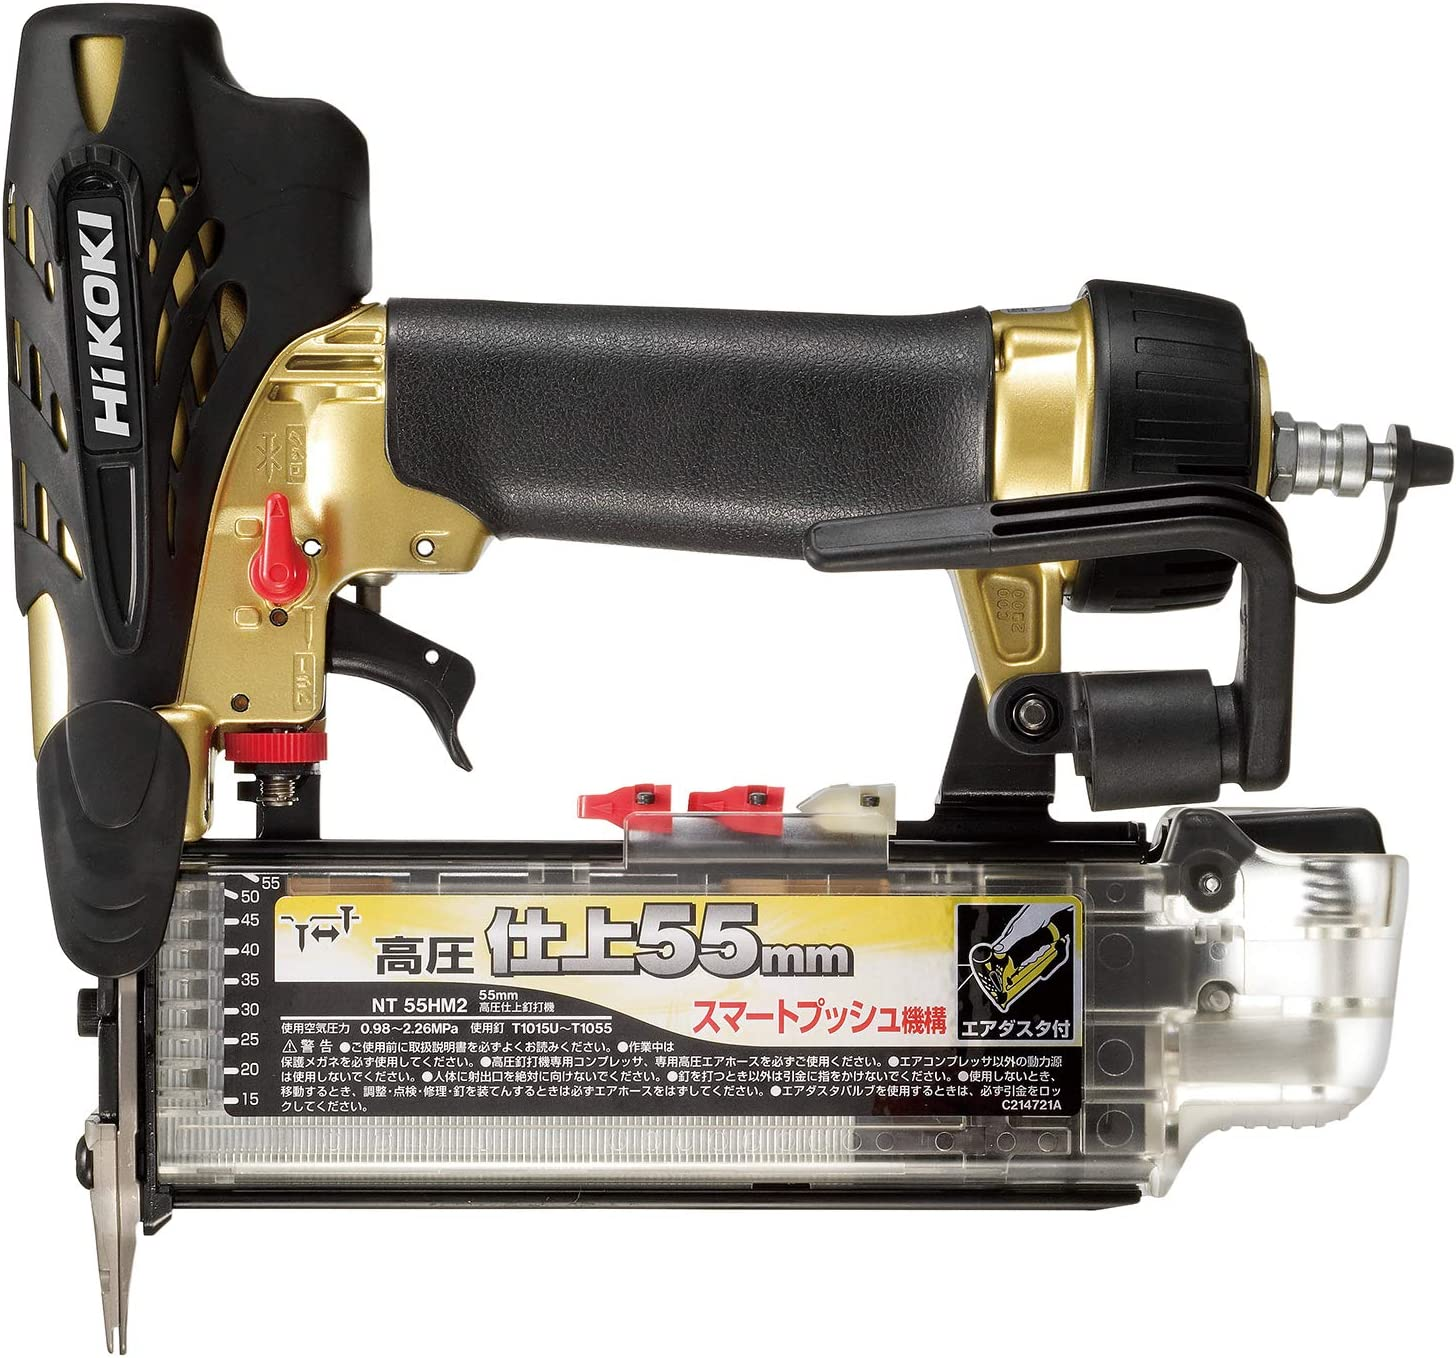 HiKOKI 高圧仕上釘打機 NT55HM2